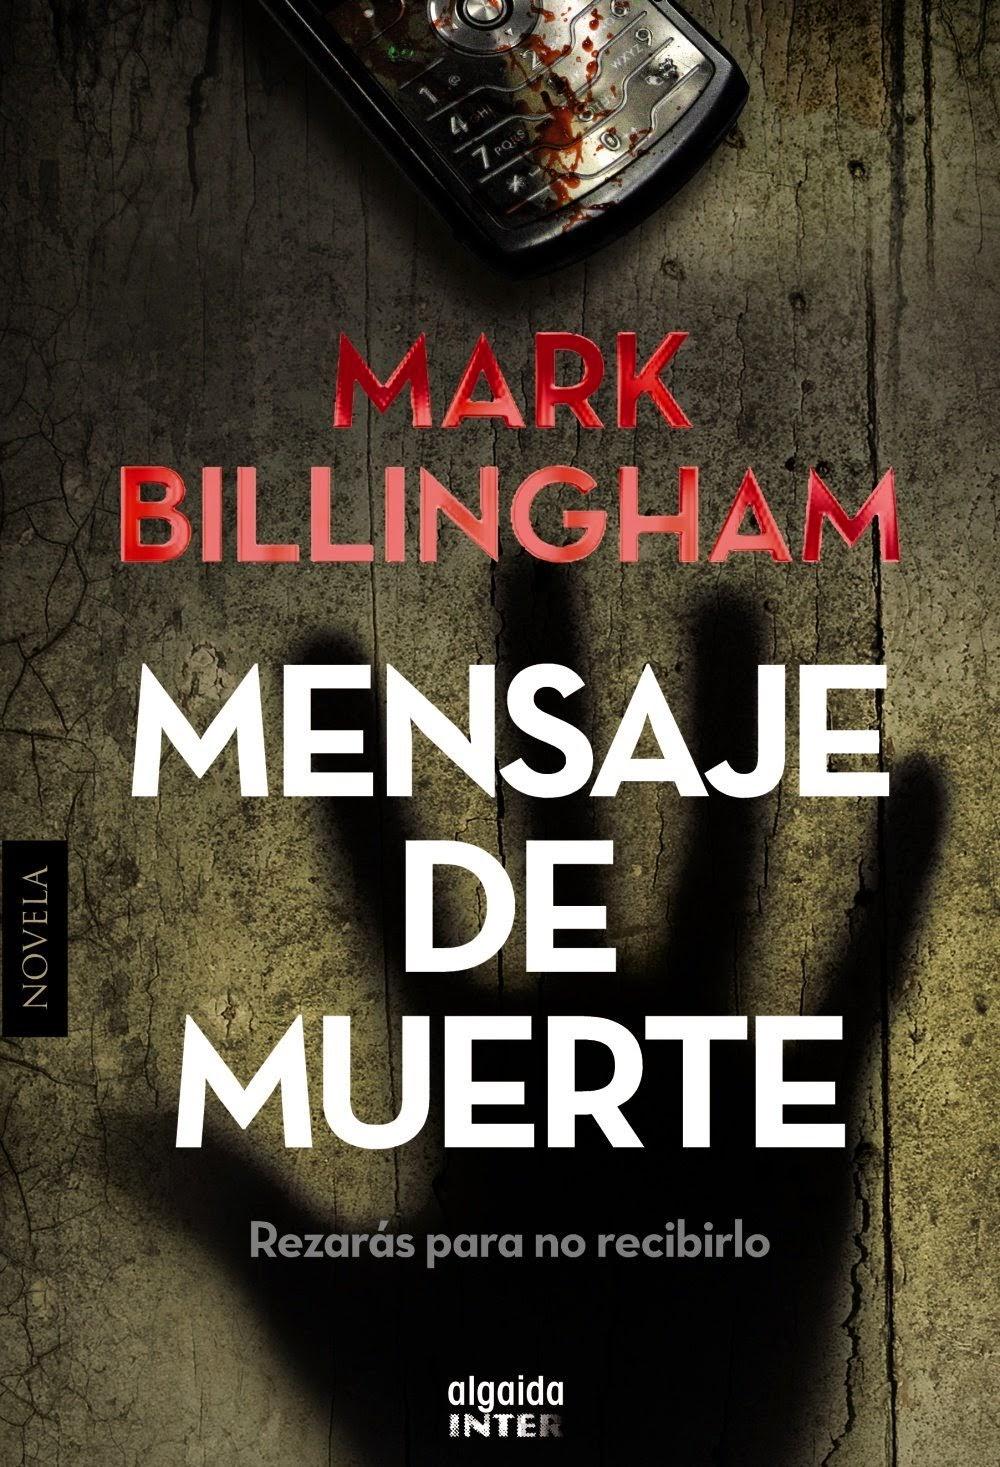 Mark Billinham